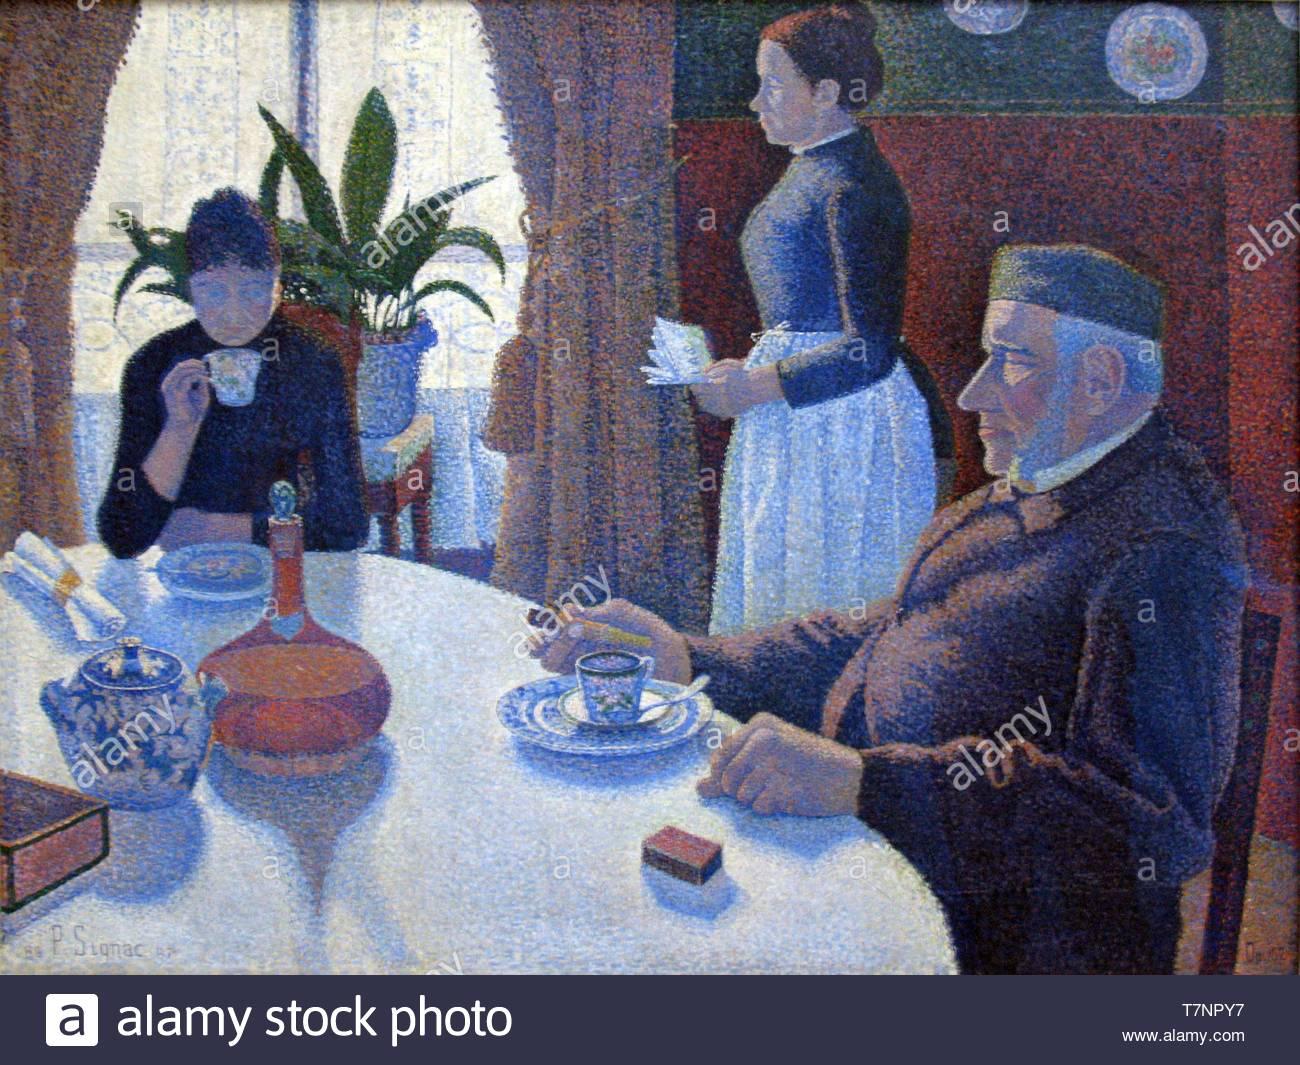 Paul-Signac-French painter, draughtsman, aquarellist and printmaker - Stock Image